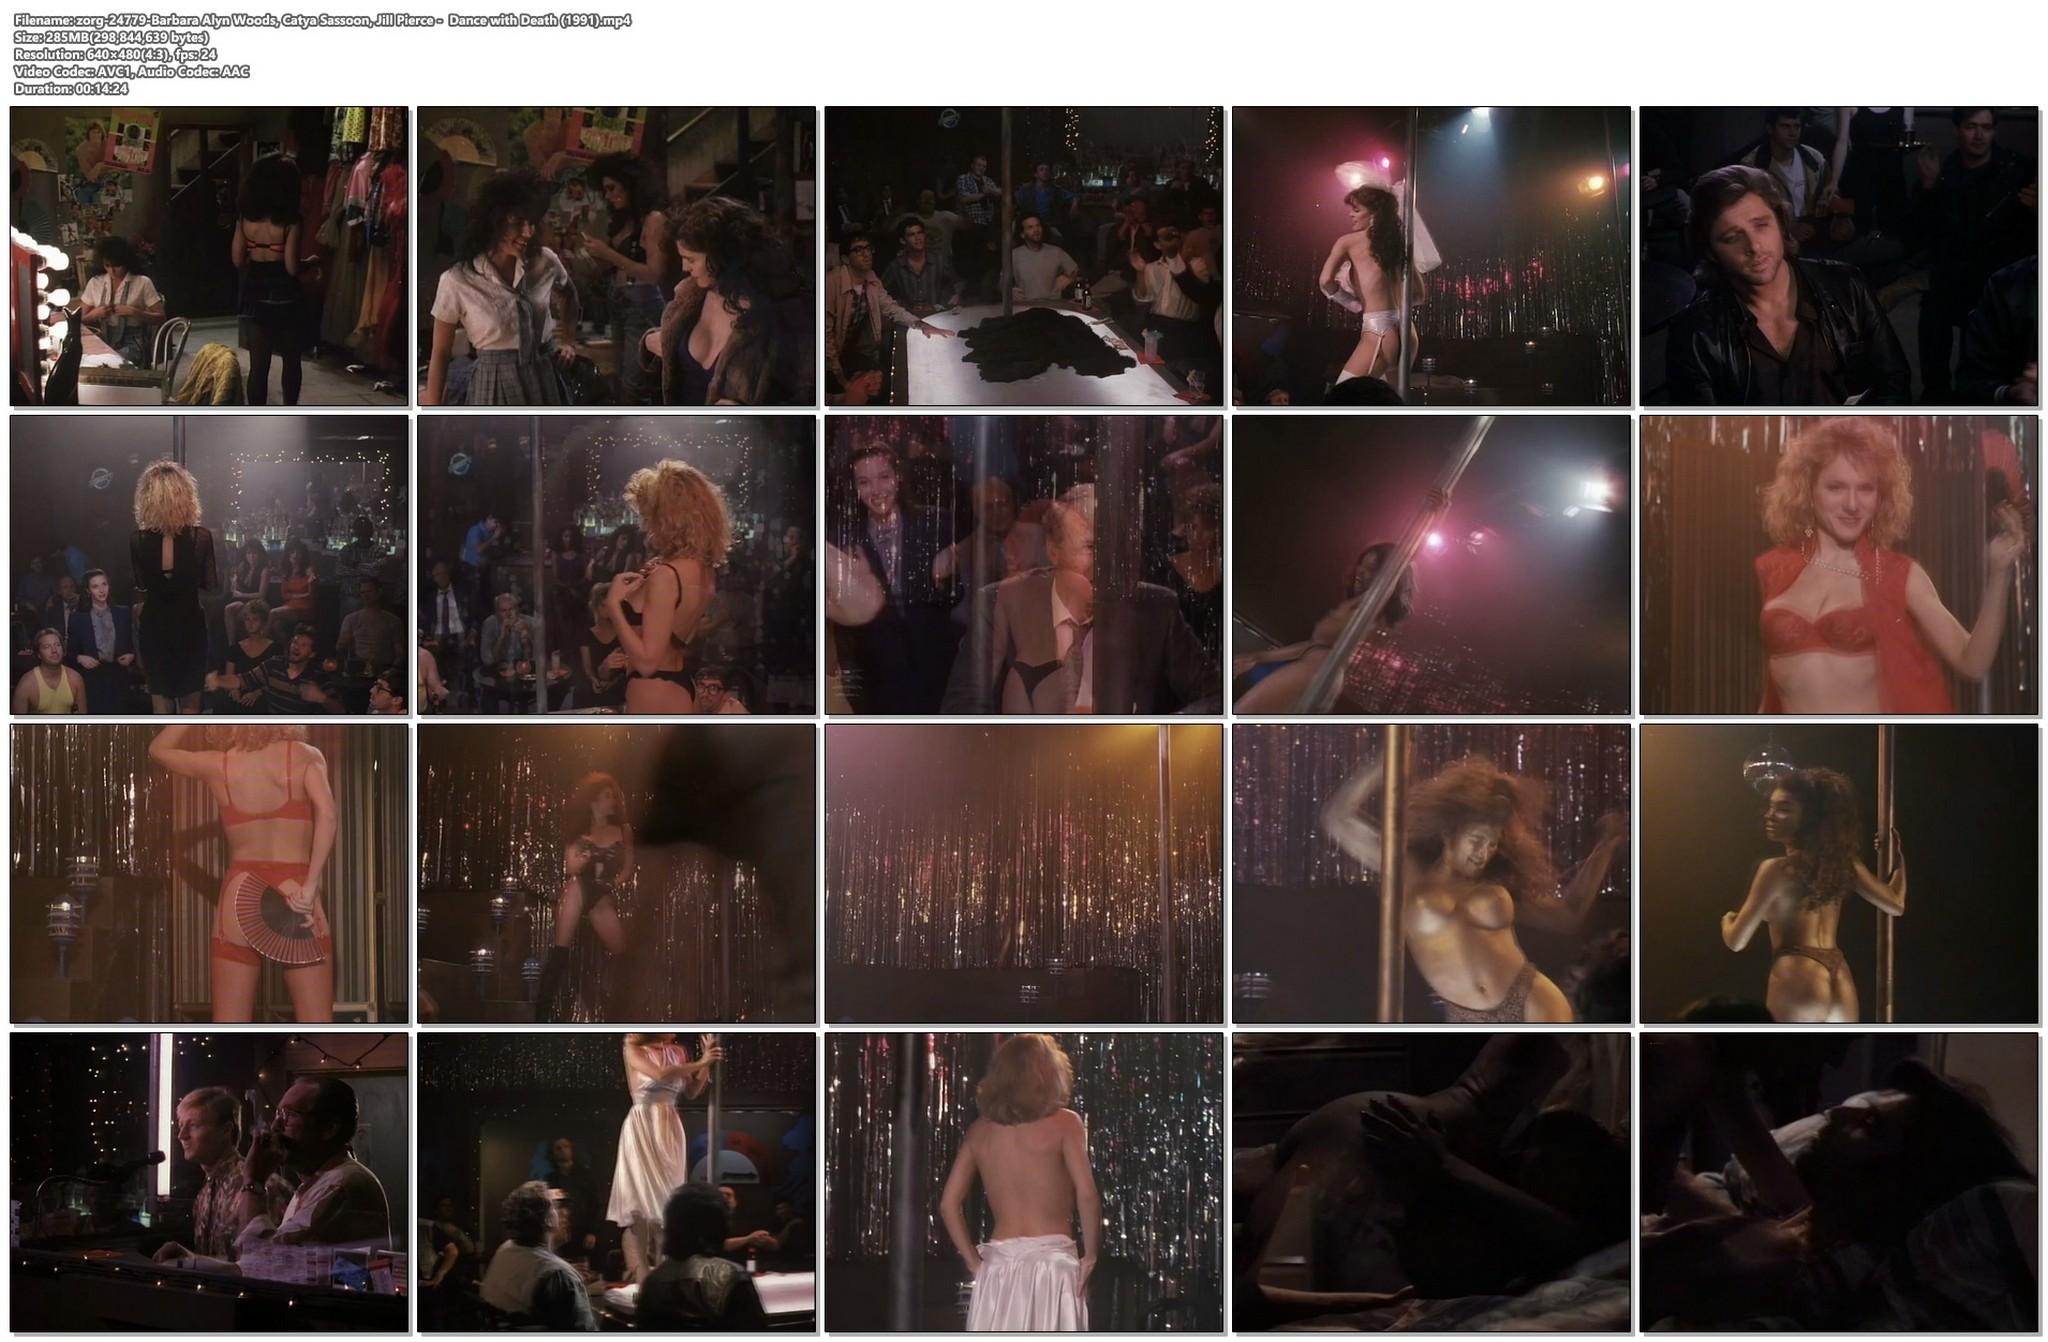 Barbara Alyn Woods nude Catya Sassoon Jill Pierce nude too as strippers Dance with Death 1991 20